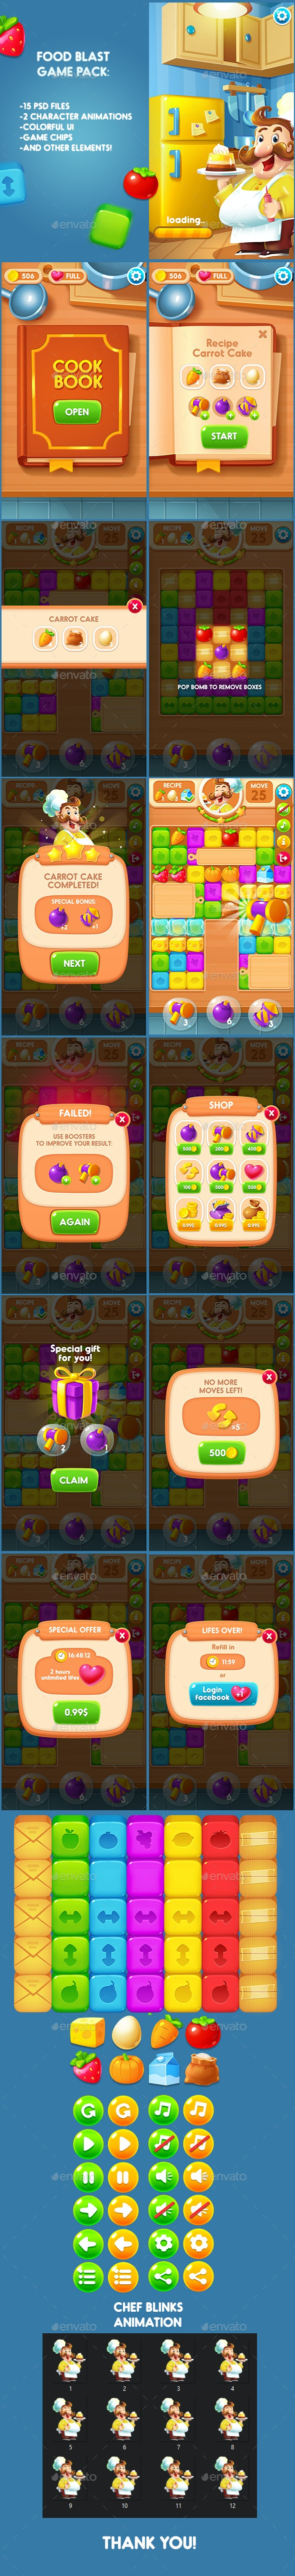 Food Blast Game Pack - Game Kits Game Assets